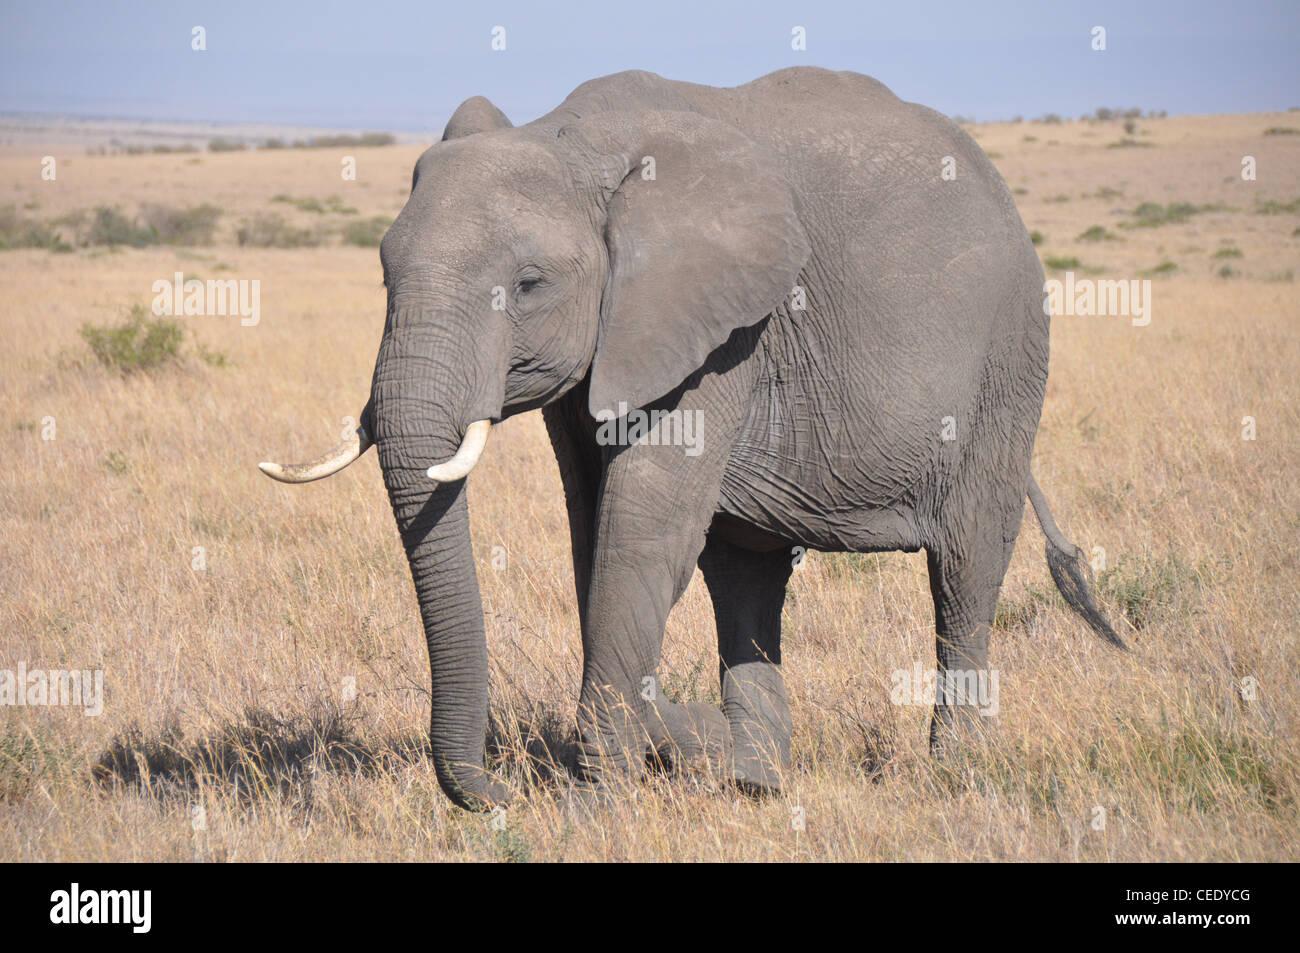 Elephant in the Savanna - Stock Image